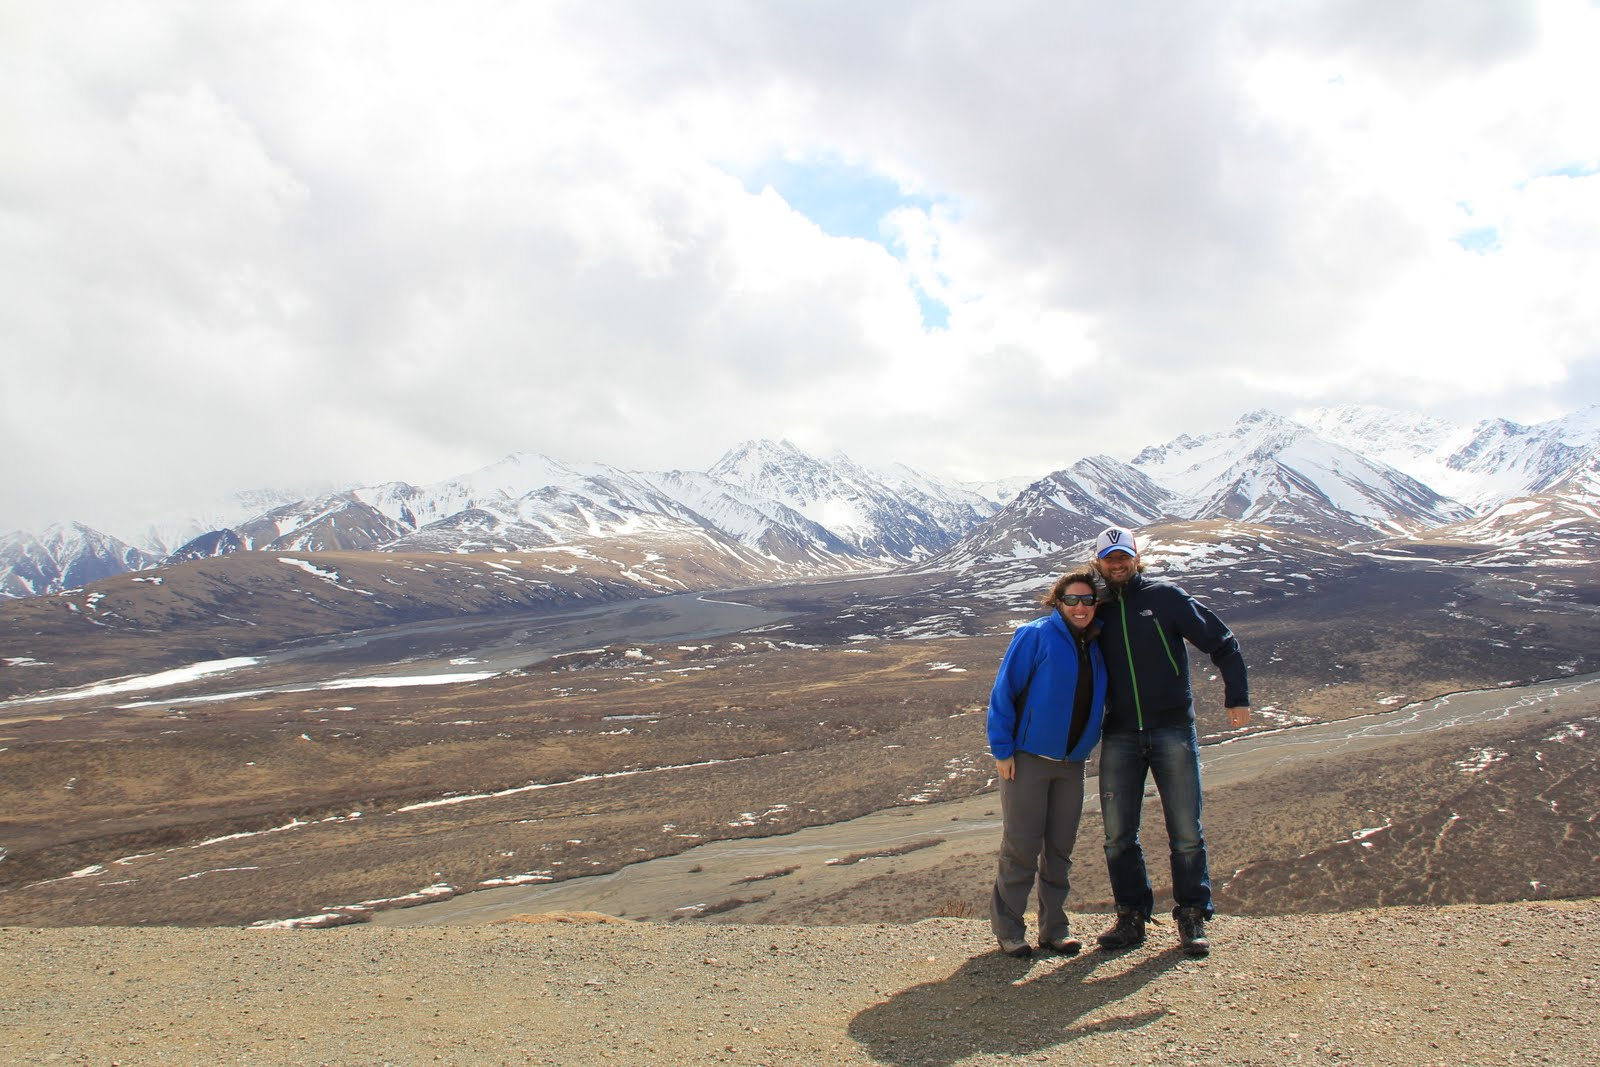 Thelistof28 Destination 26 Alaska Into The Wild Part 2